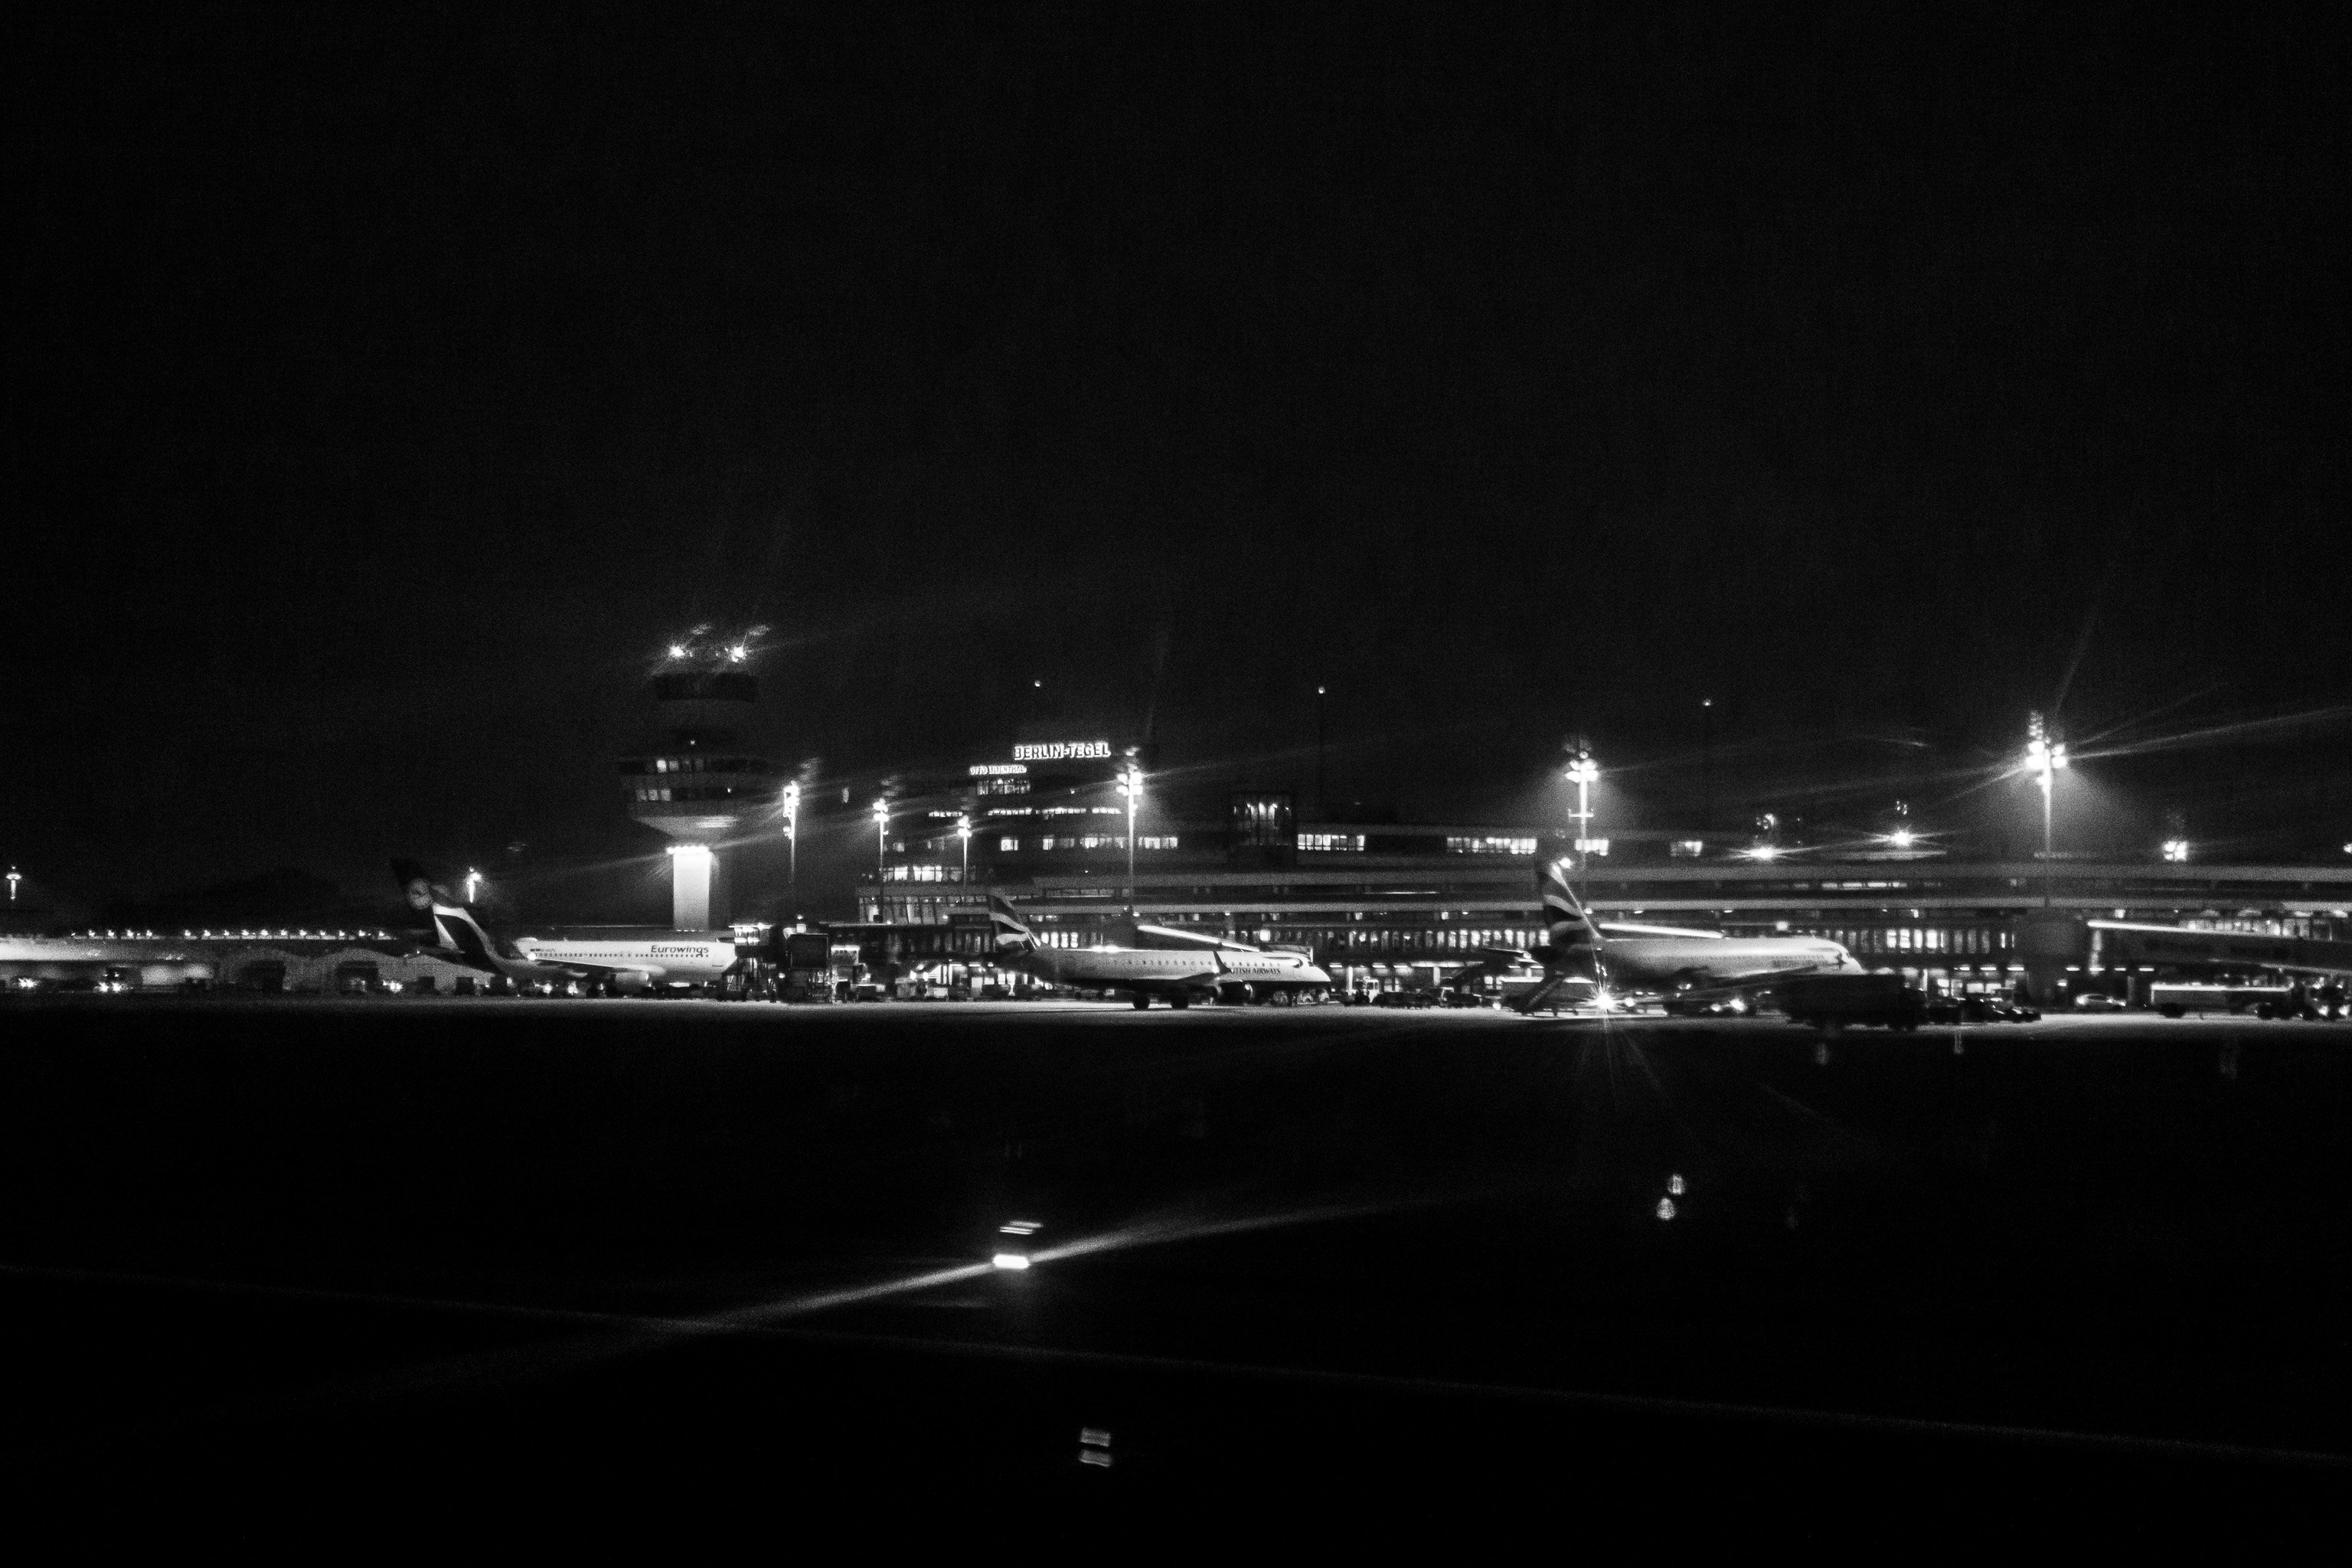 Vol de Nuit (15 von 16)